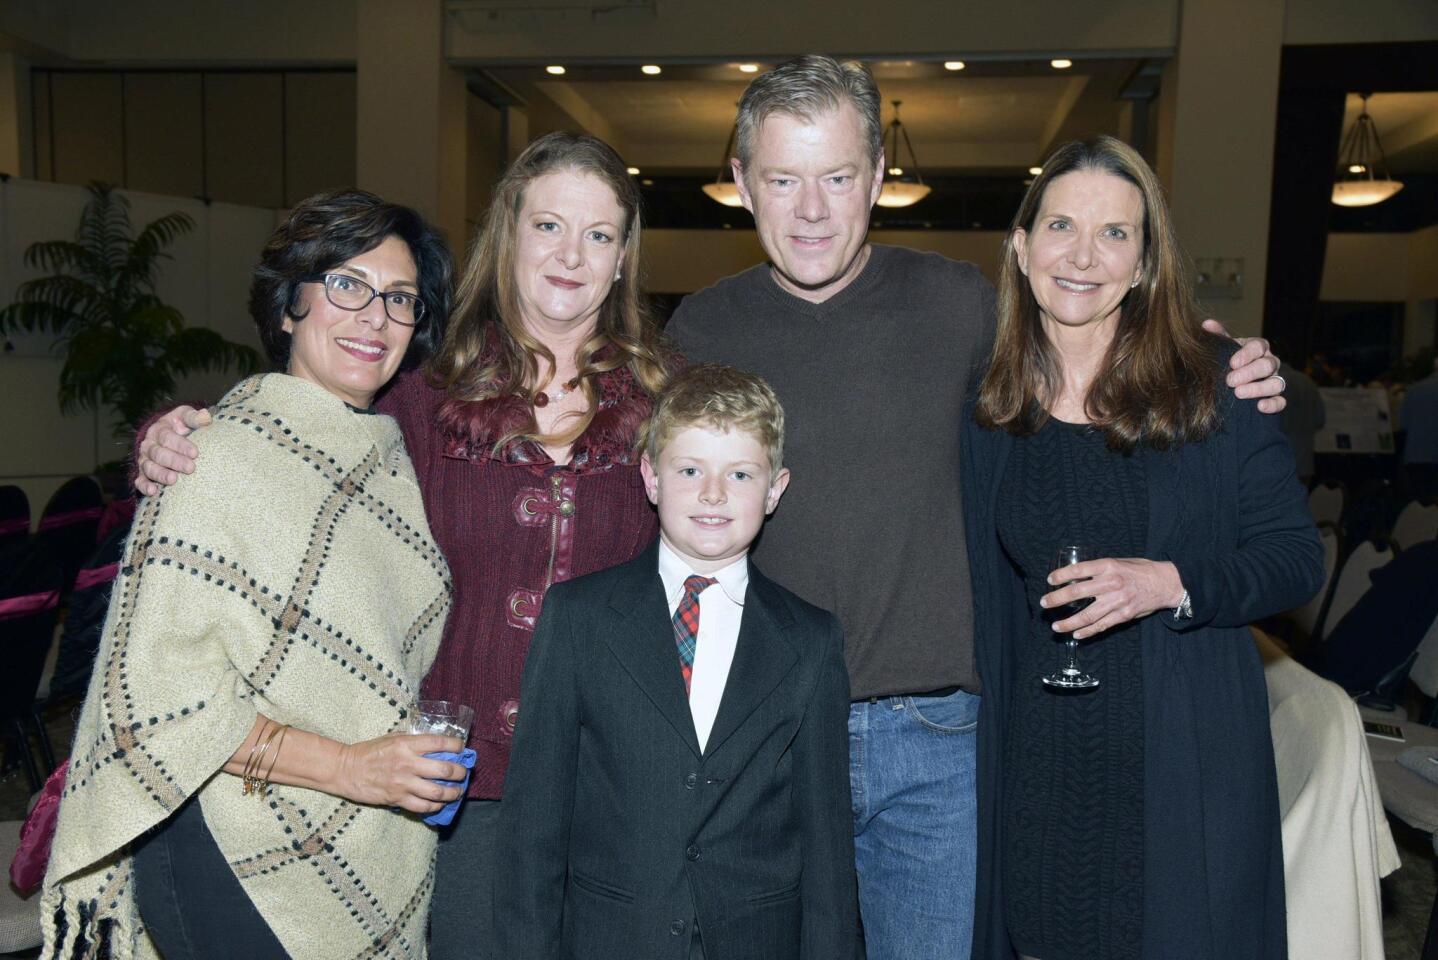 Board member Roberta Arzola, Kari and John Carley with Matthew, board member Jill Stiker